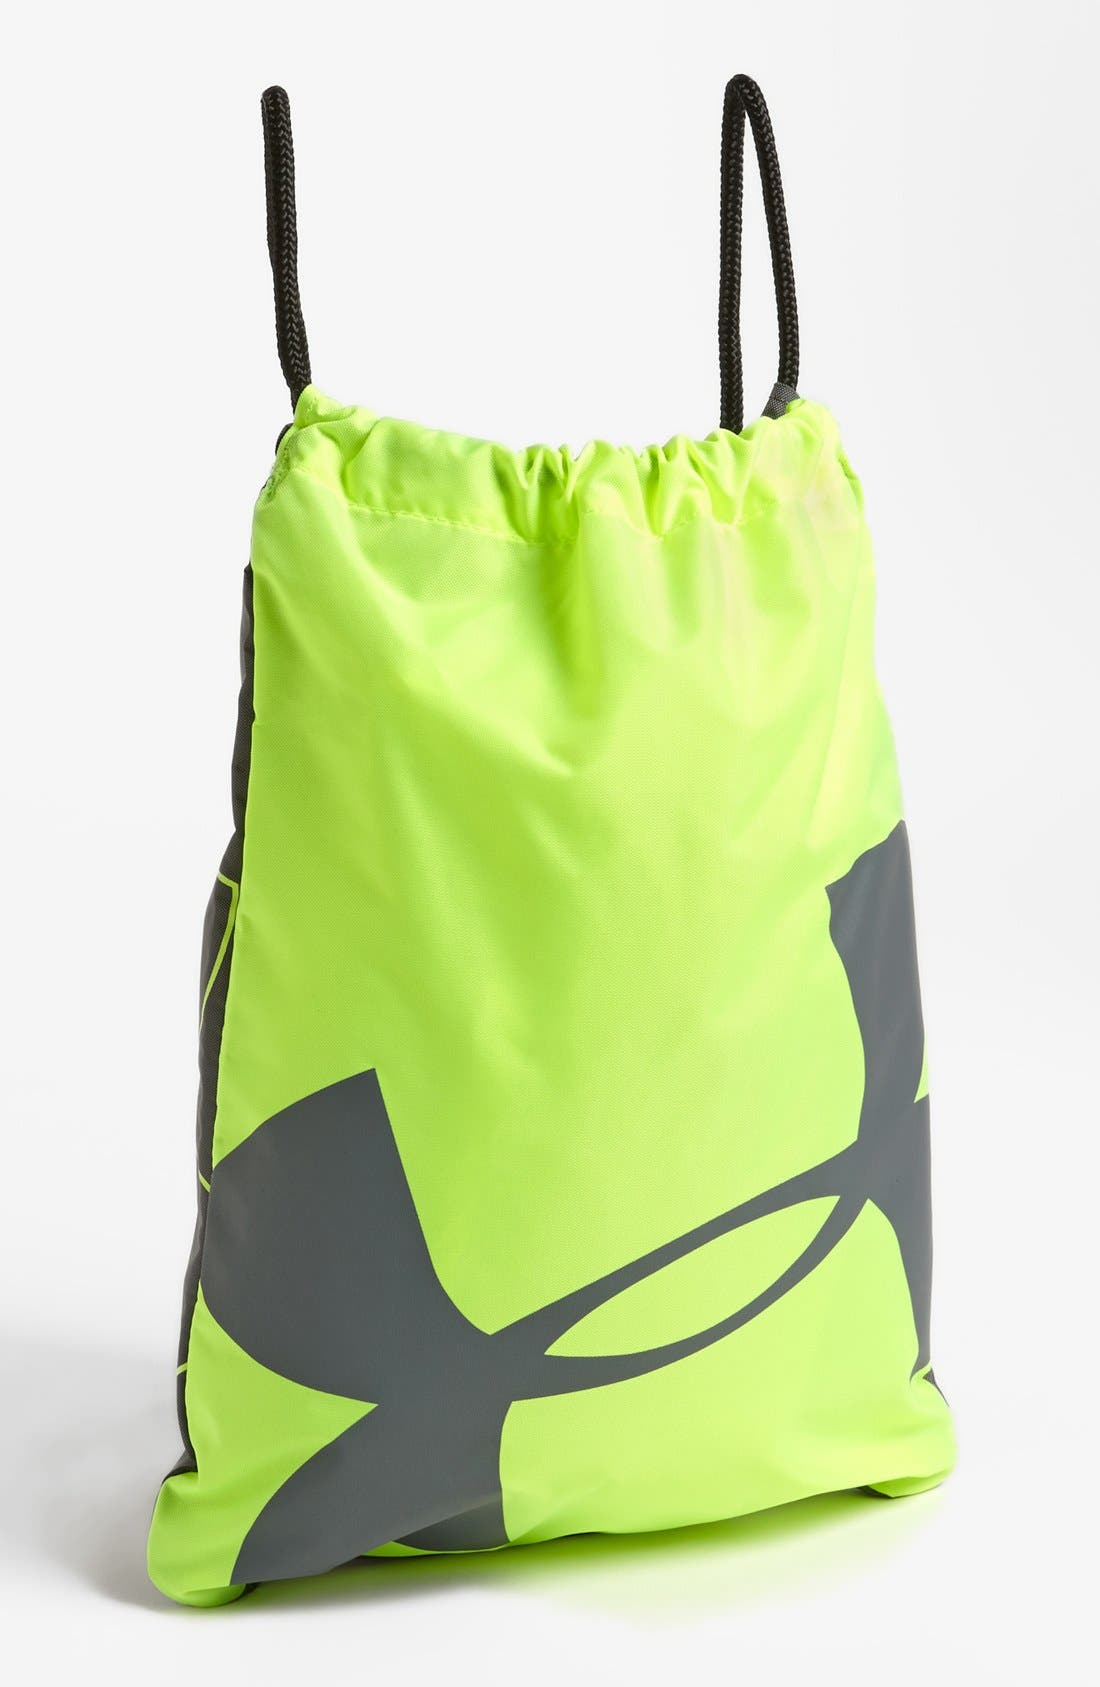 Main Image - Under Armour 'Dauntless' Drawstring Backpack